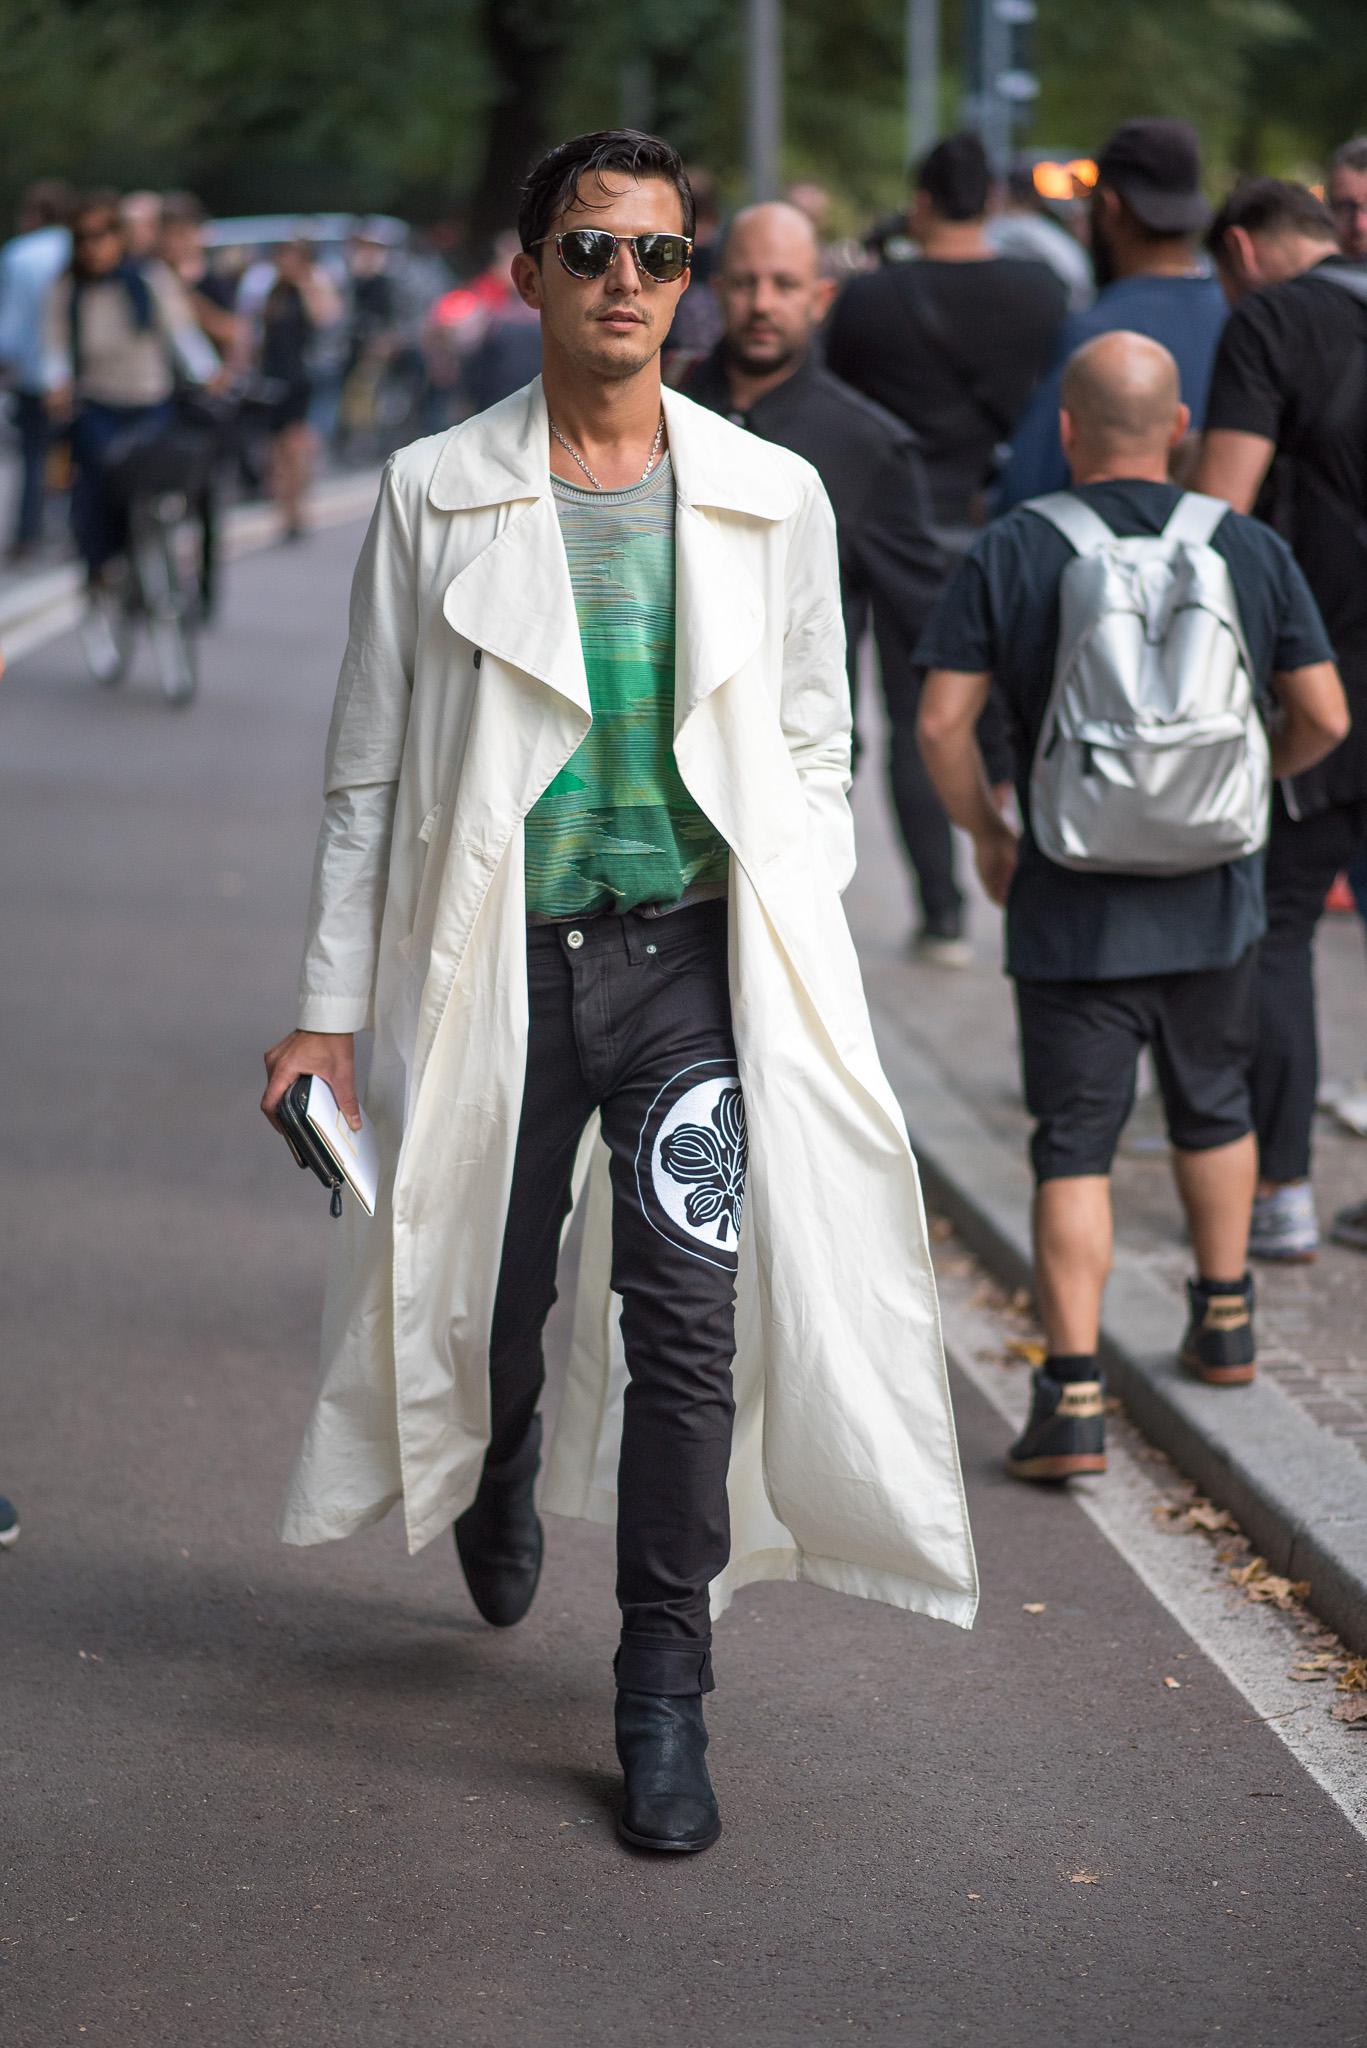 Alessandro Enriquez Versace MFW September 2017 Photography Annika Lagerqvist www.annikasomething.com